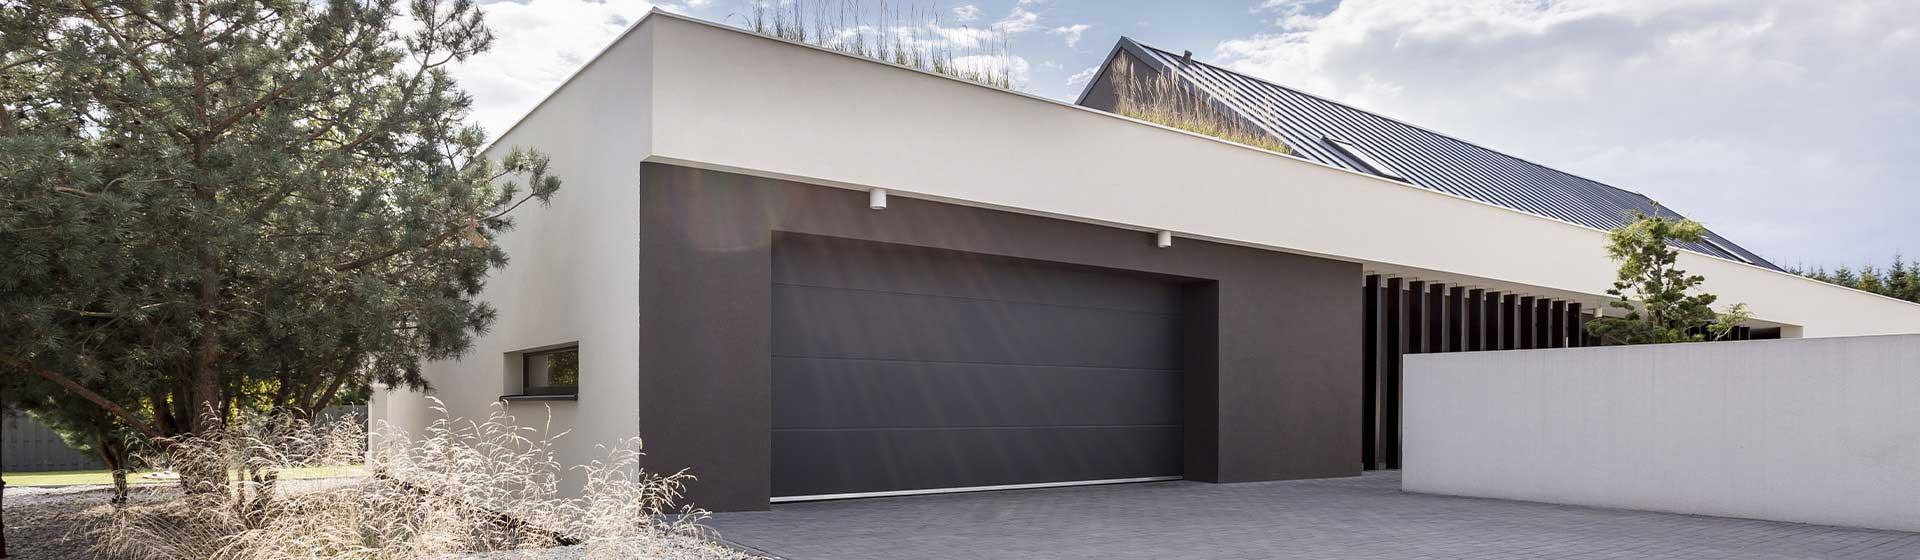 Haus mit geräumiger Garage